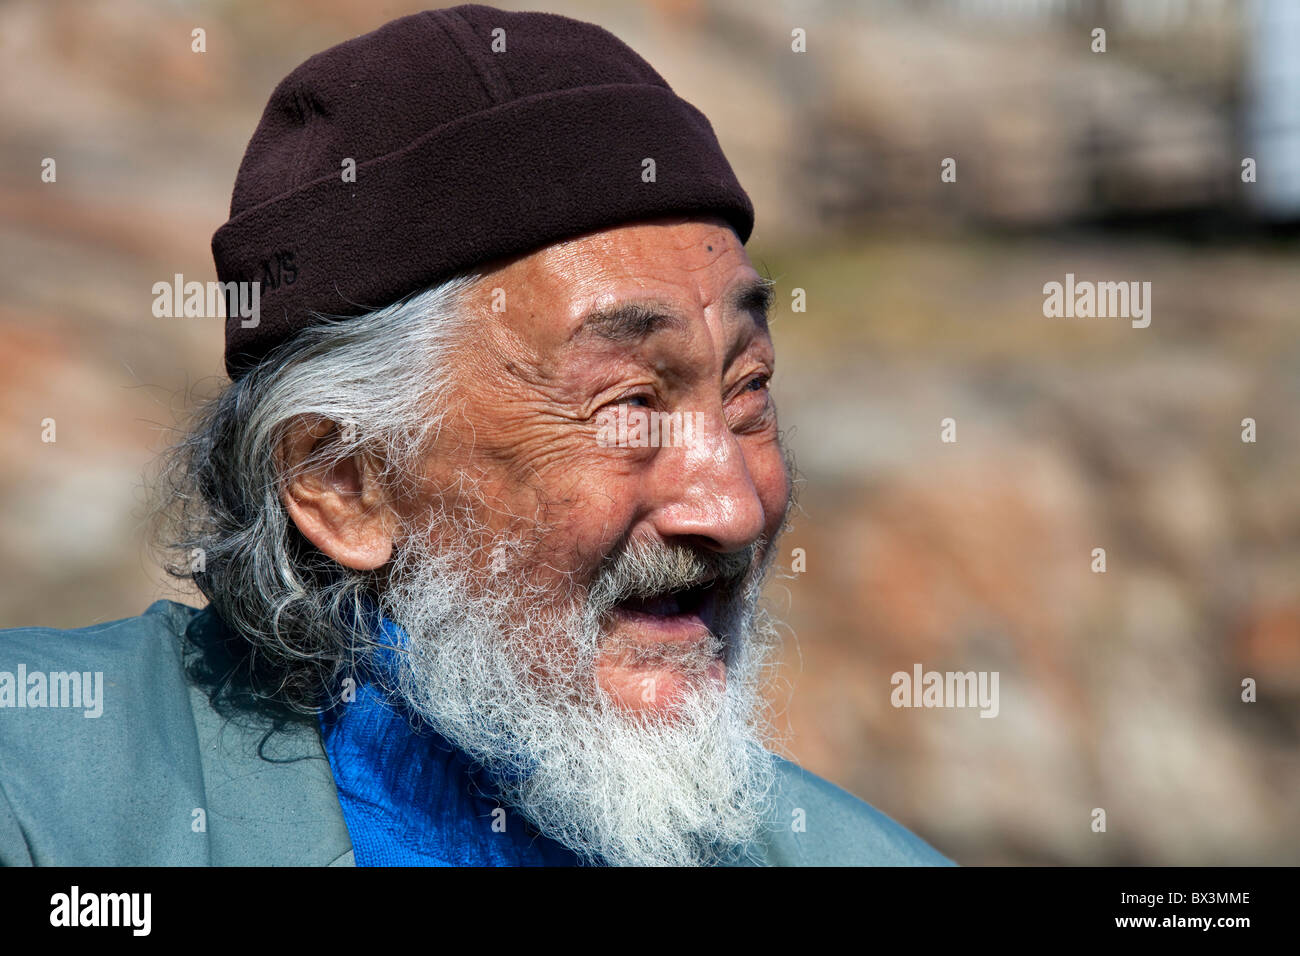 Portrait of elderly Inuit man from Uummannaq, North-Greenland, Greenland - Stock Image